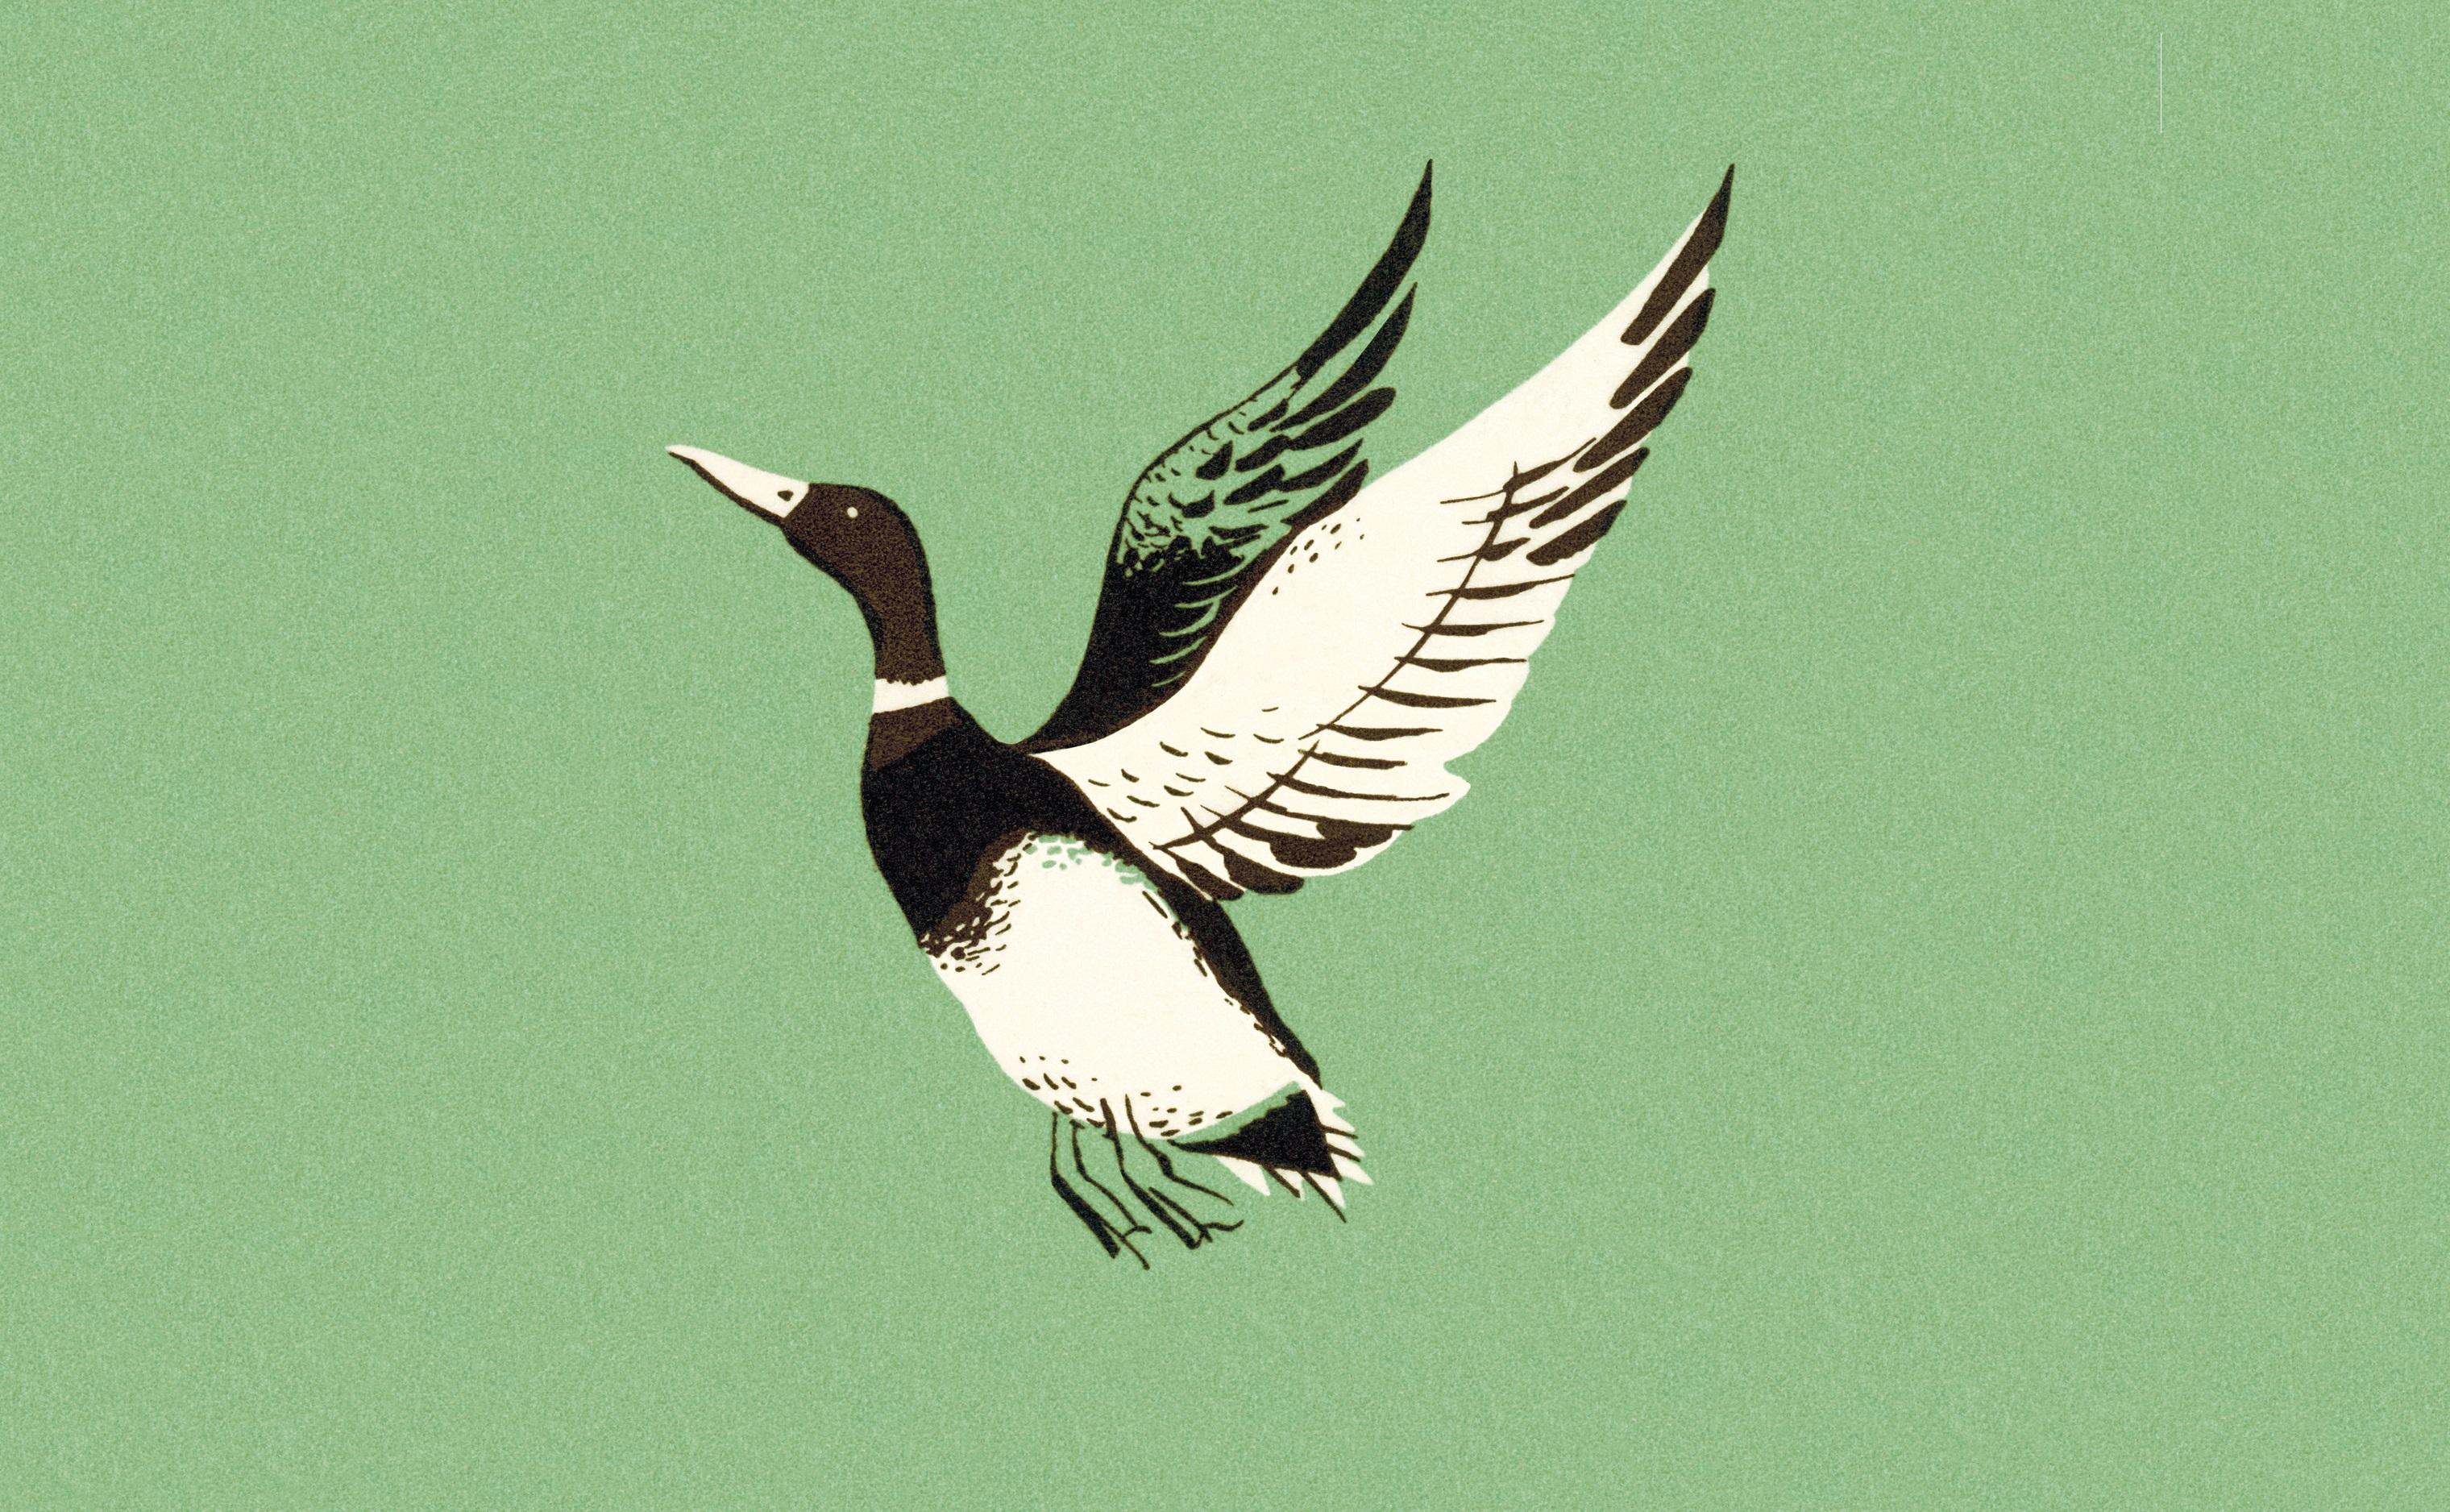 Managing customer service staff: 10 ways to turn ducks into eagles